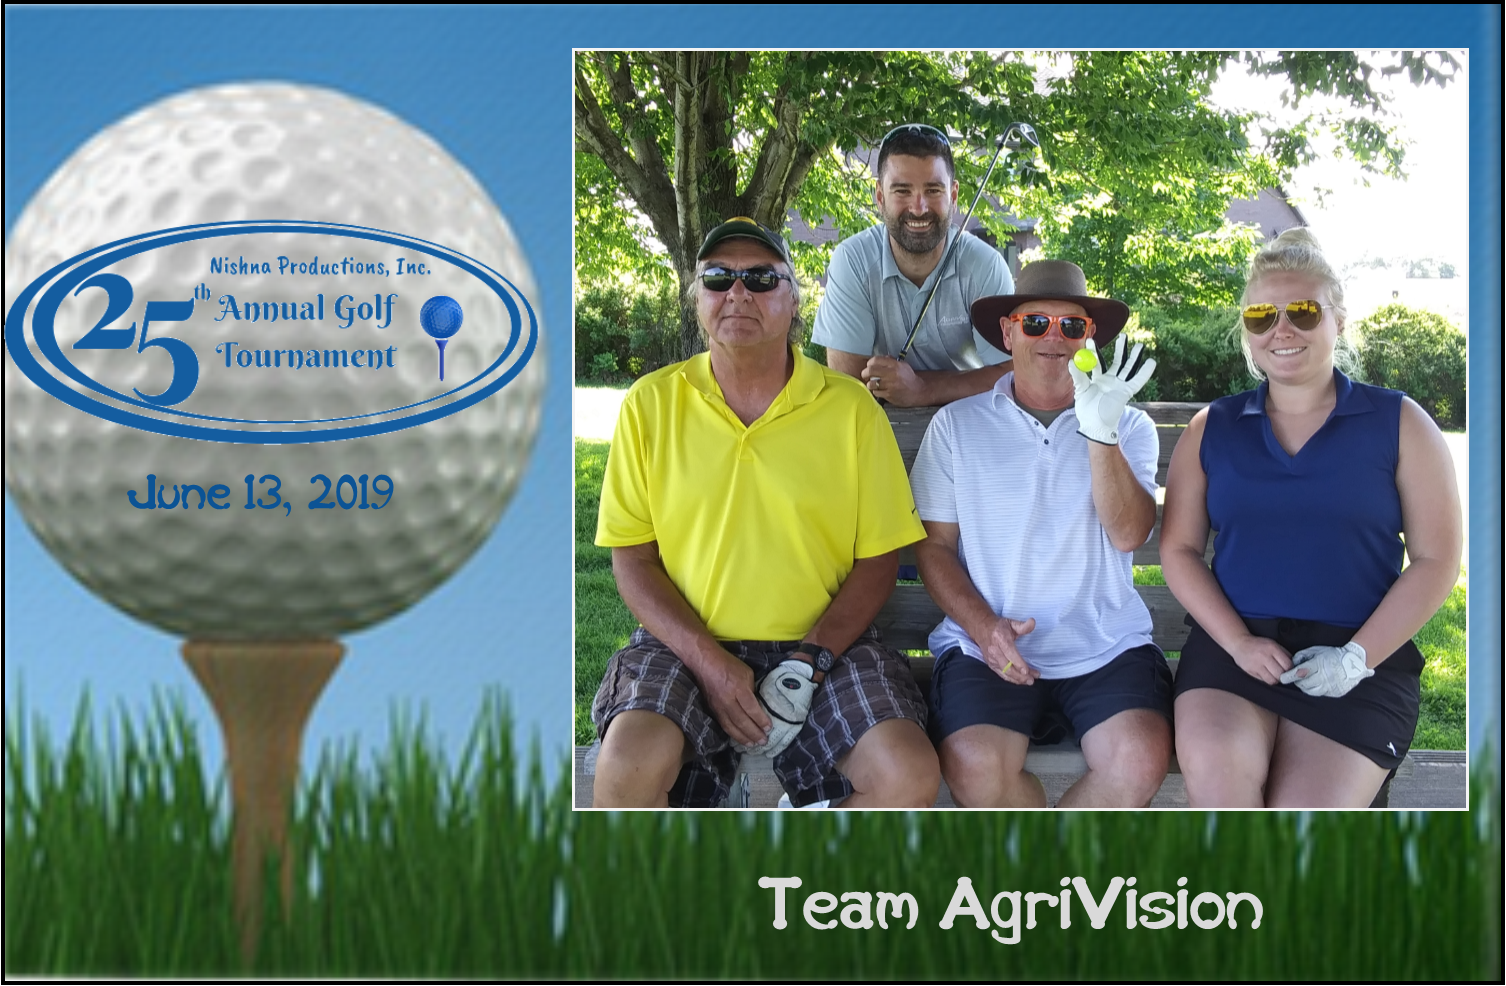 Team AgriVision